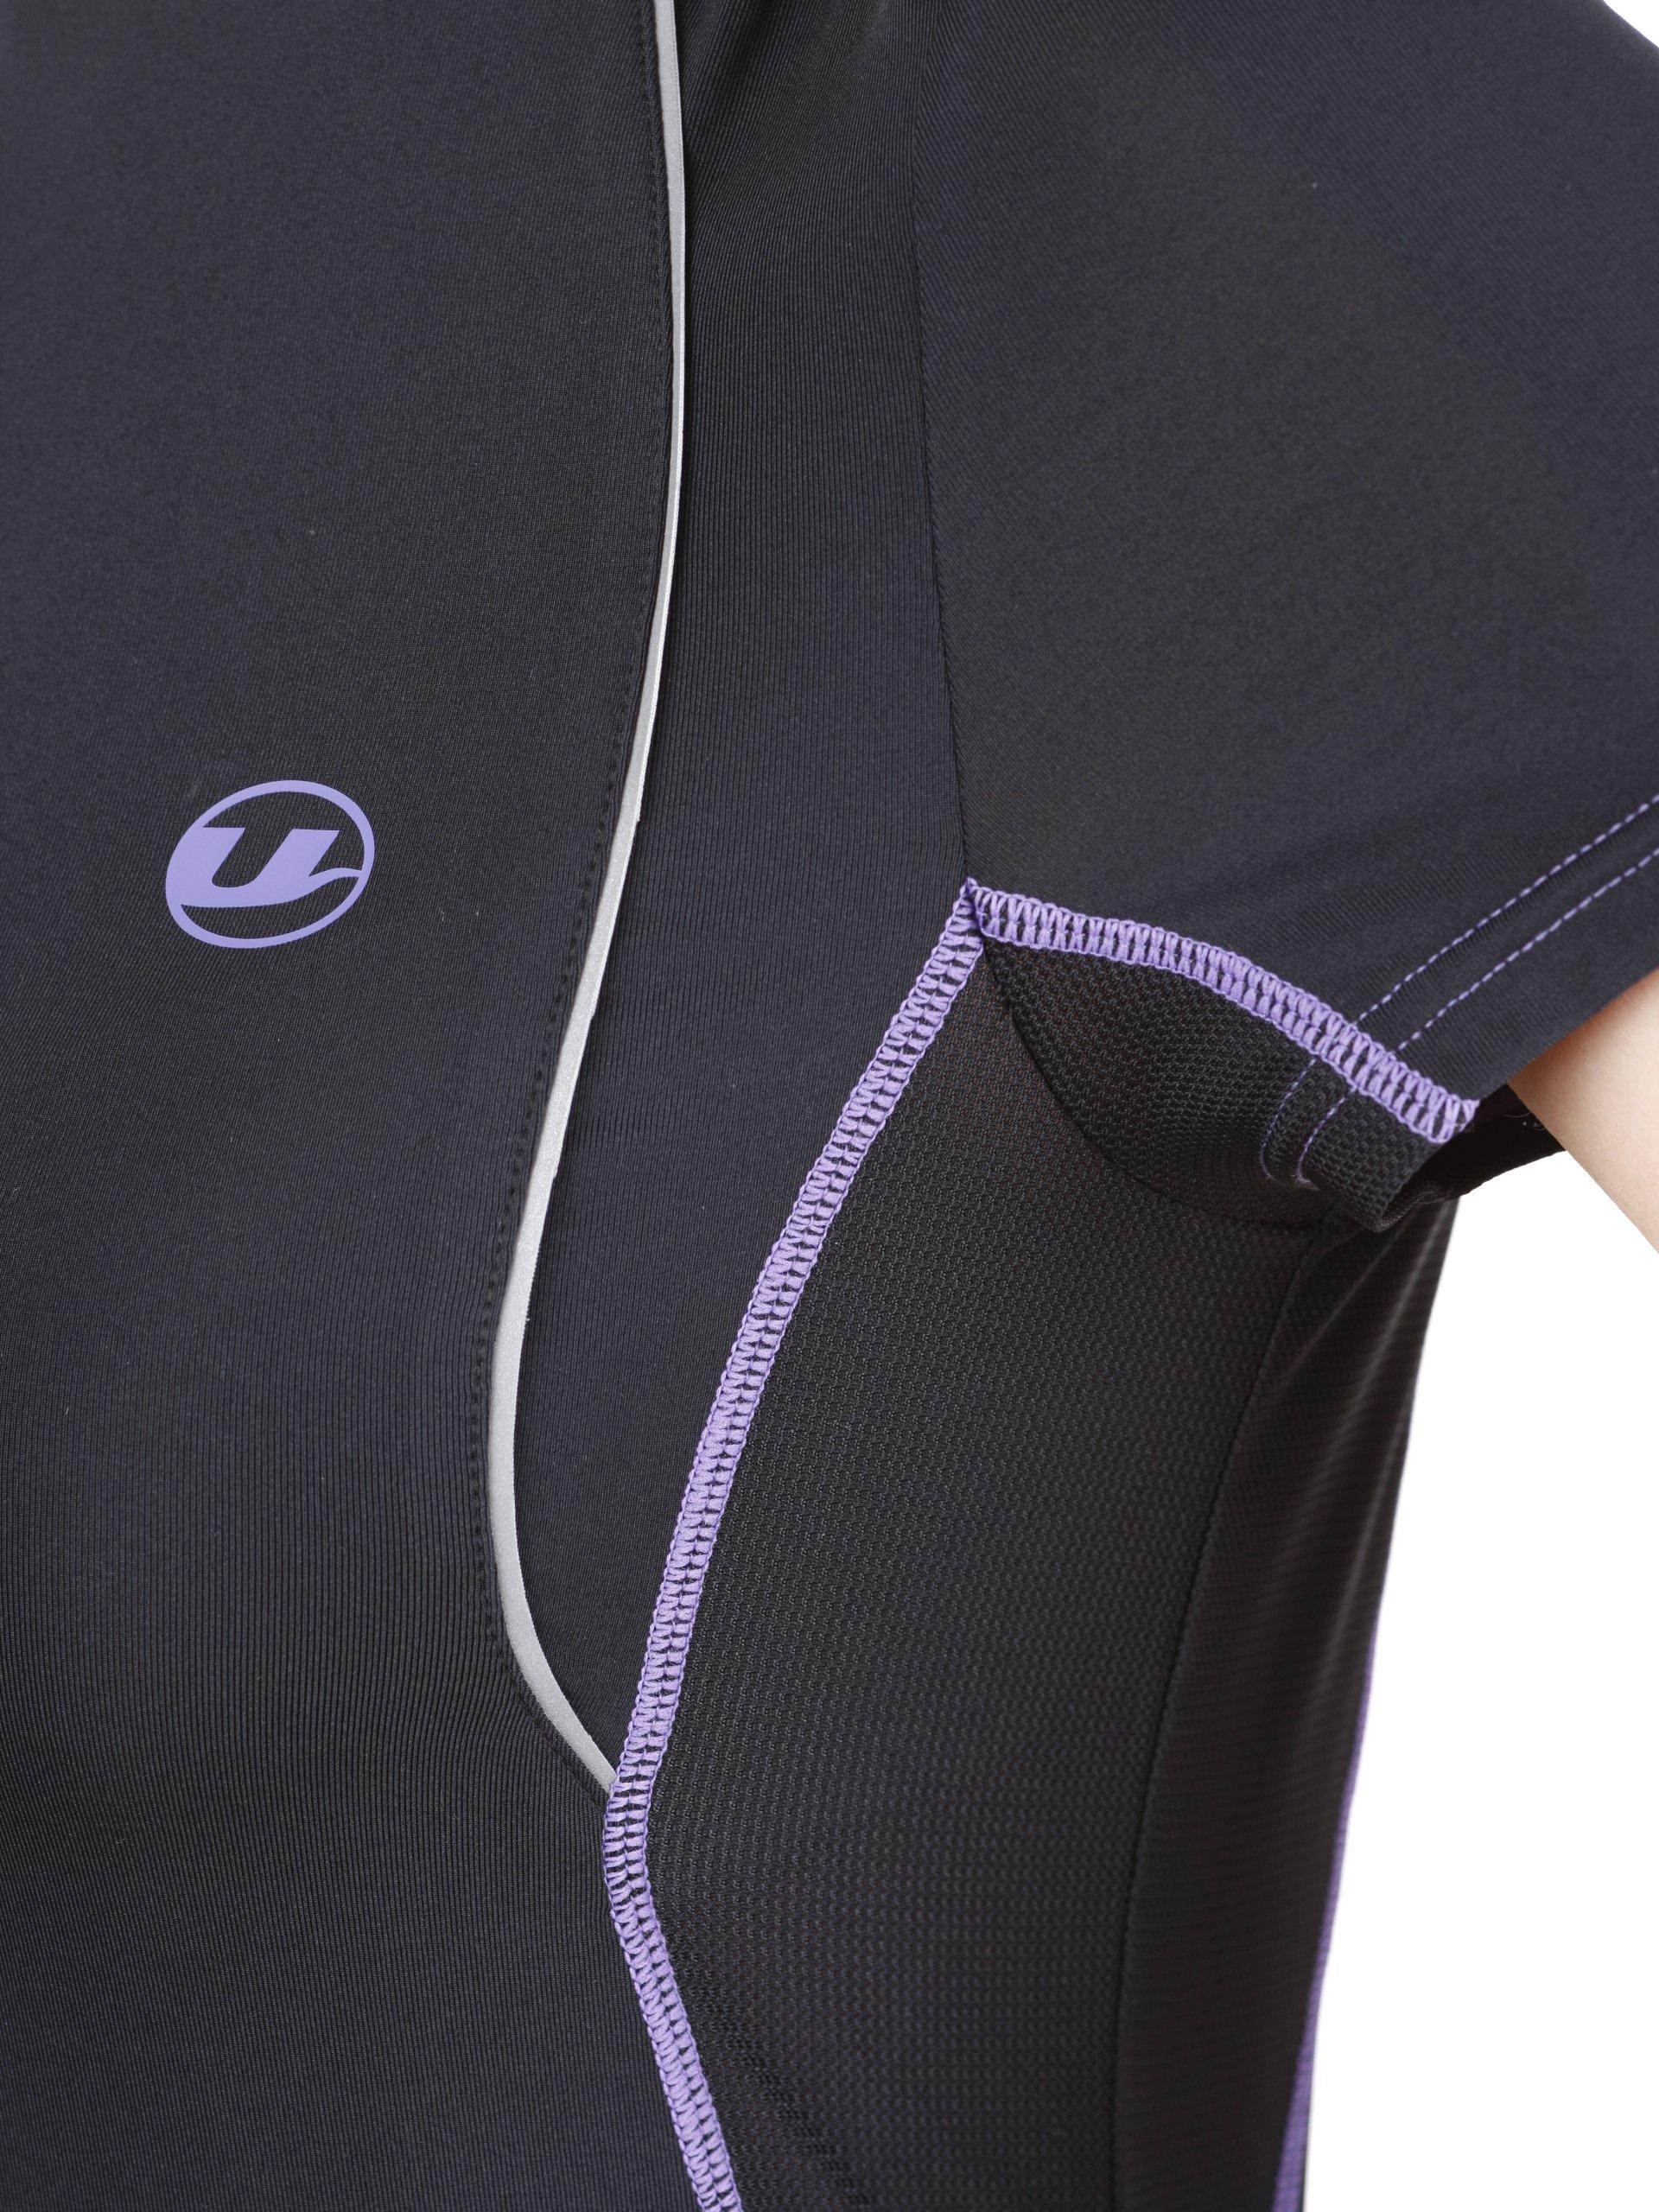 Ultrasport Maglietta da Running Donna con Asciugatura Rapida Quick-Dry